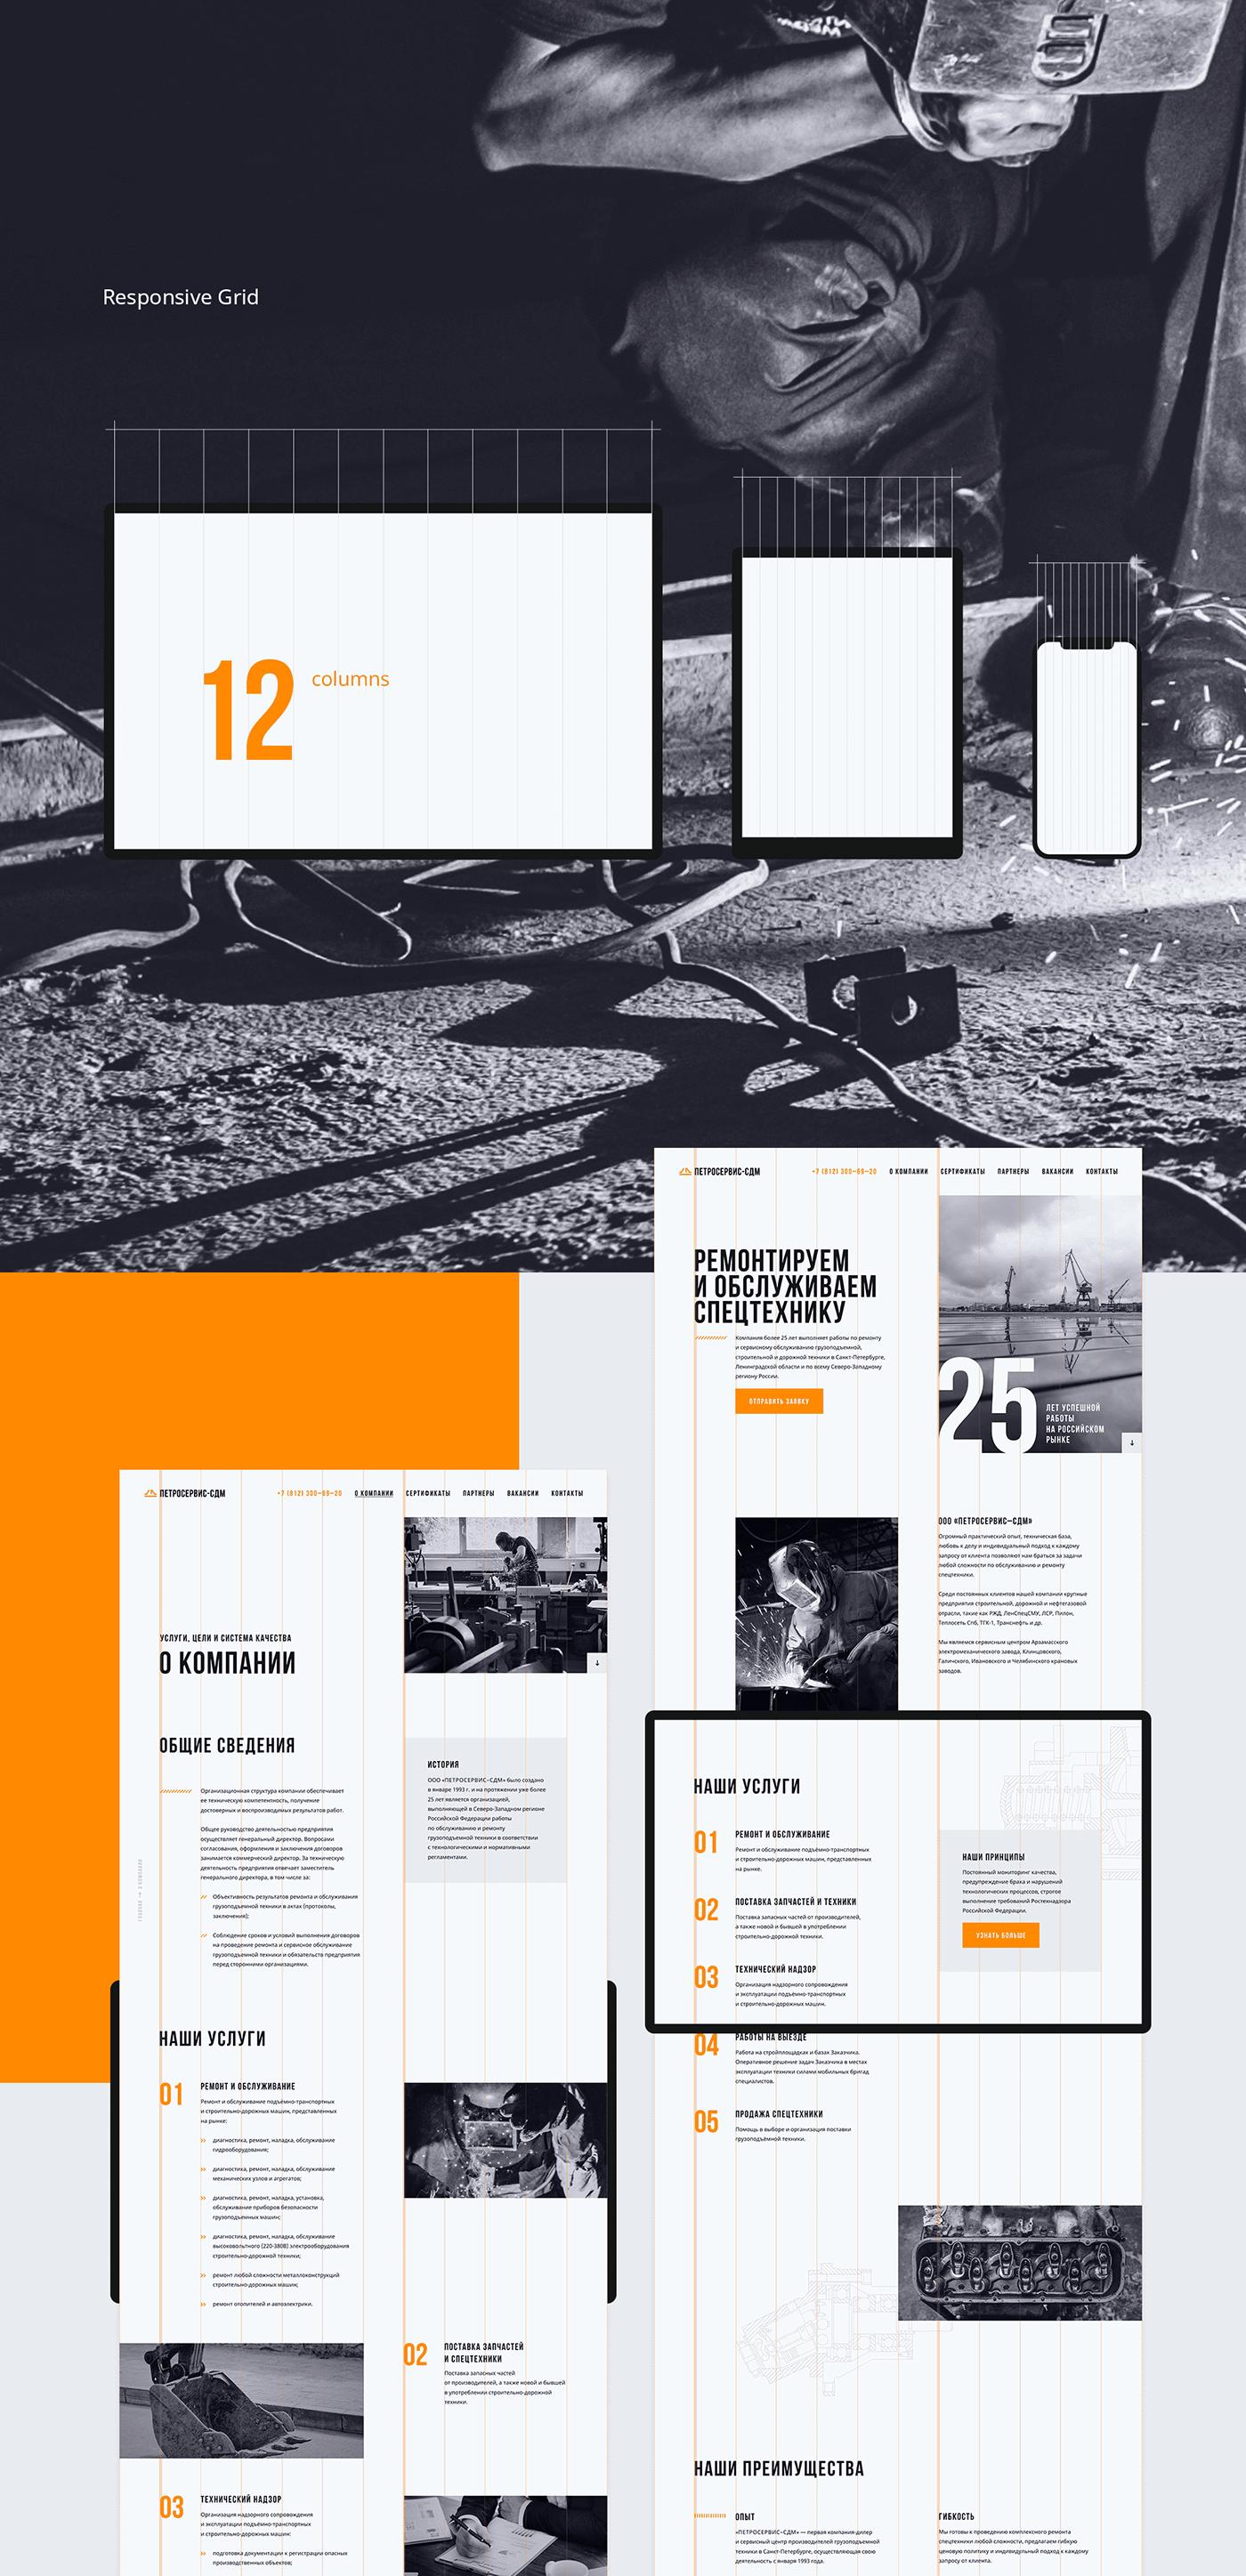 Website Website Design ui design user interface UX design Web Design  UI digital Layout minimal